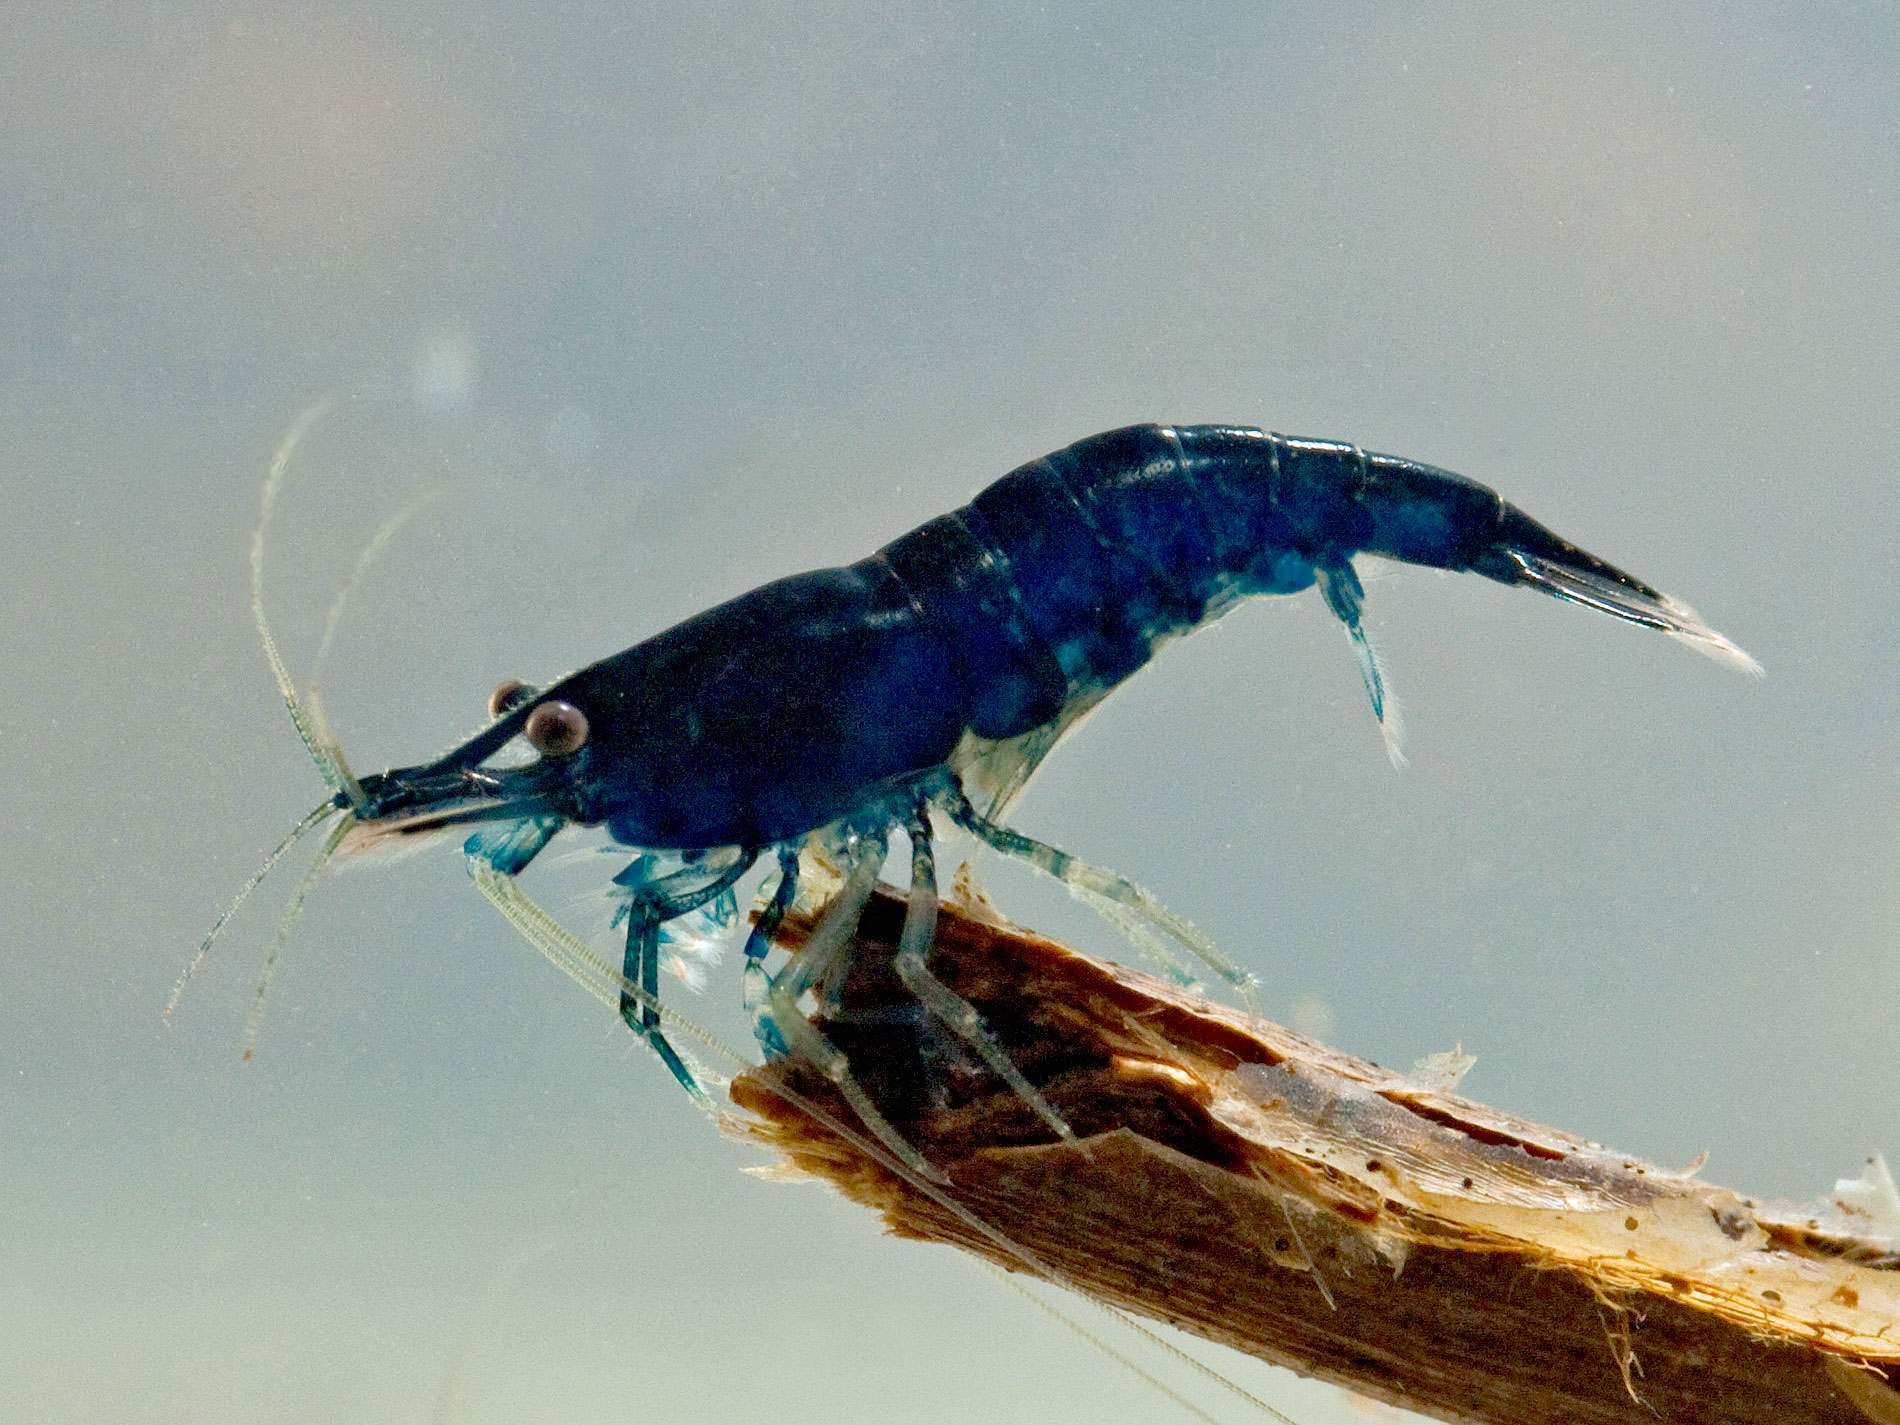 neu blue sapphire neocaridina davidi neues im garnelenhaus der wirbellotse. Black Bedroom Furniture Sets. Home Design Ideas